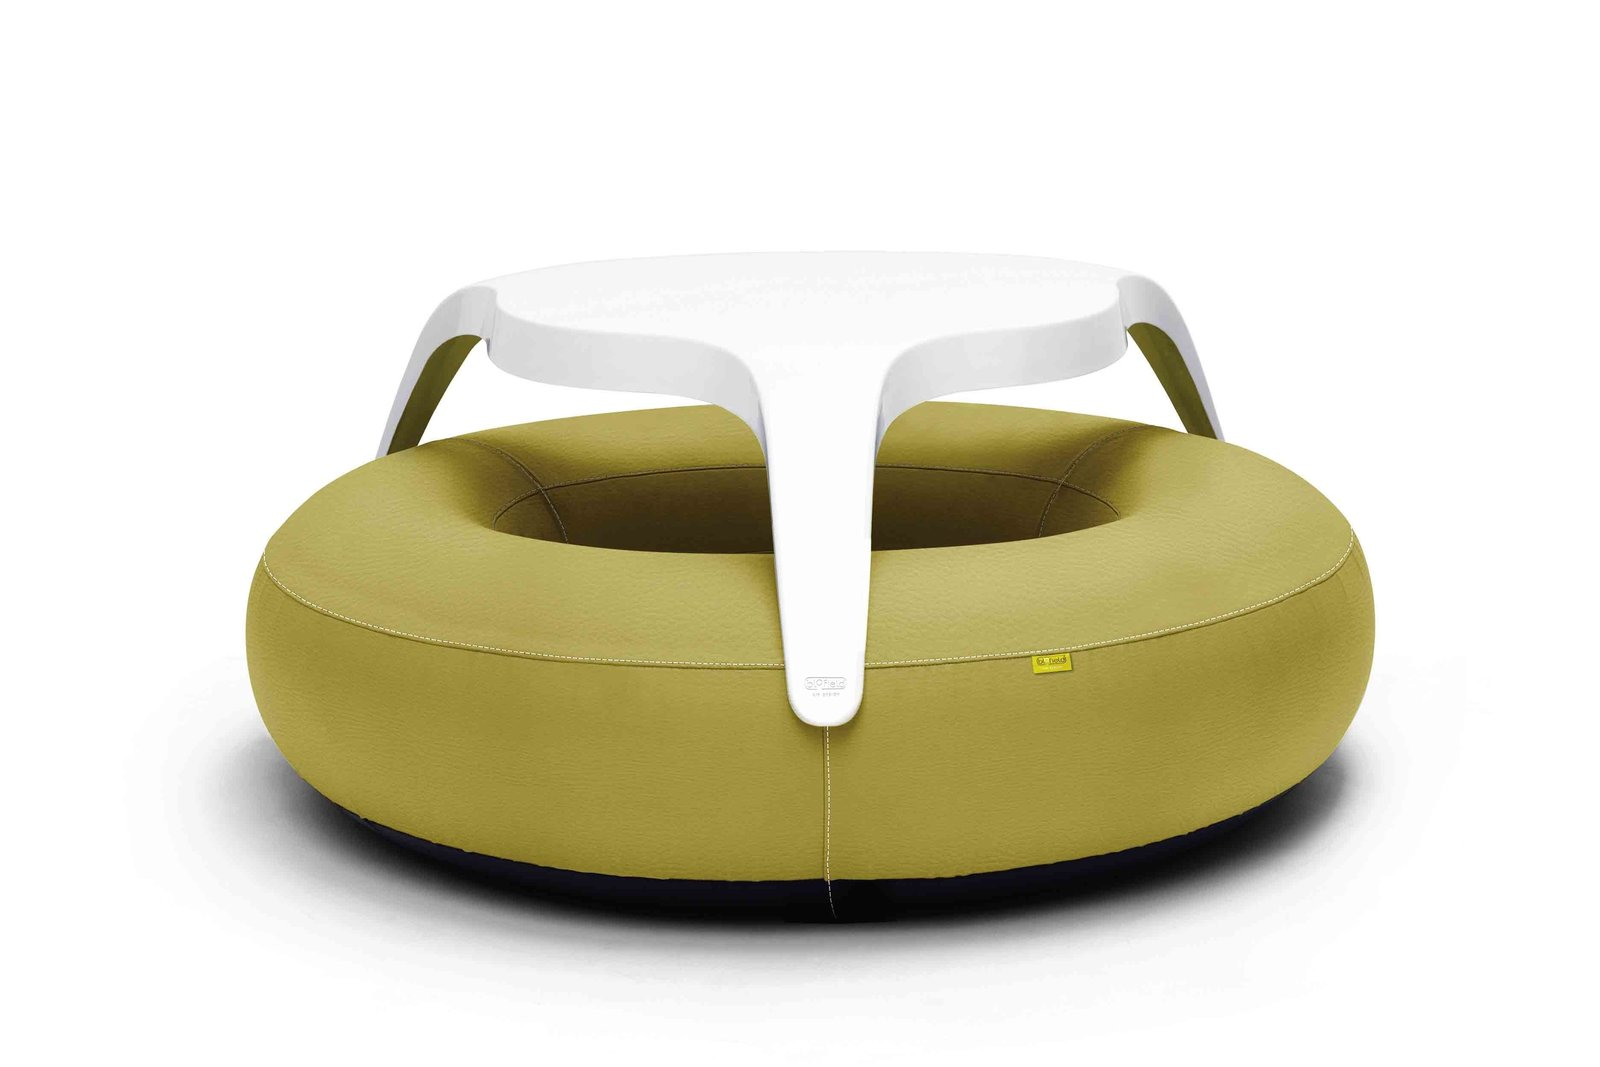 Donut by Dirk Wynants  Pneumatic Design